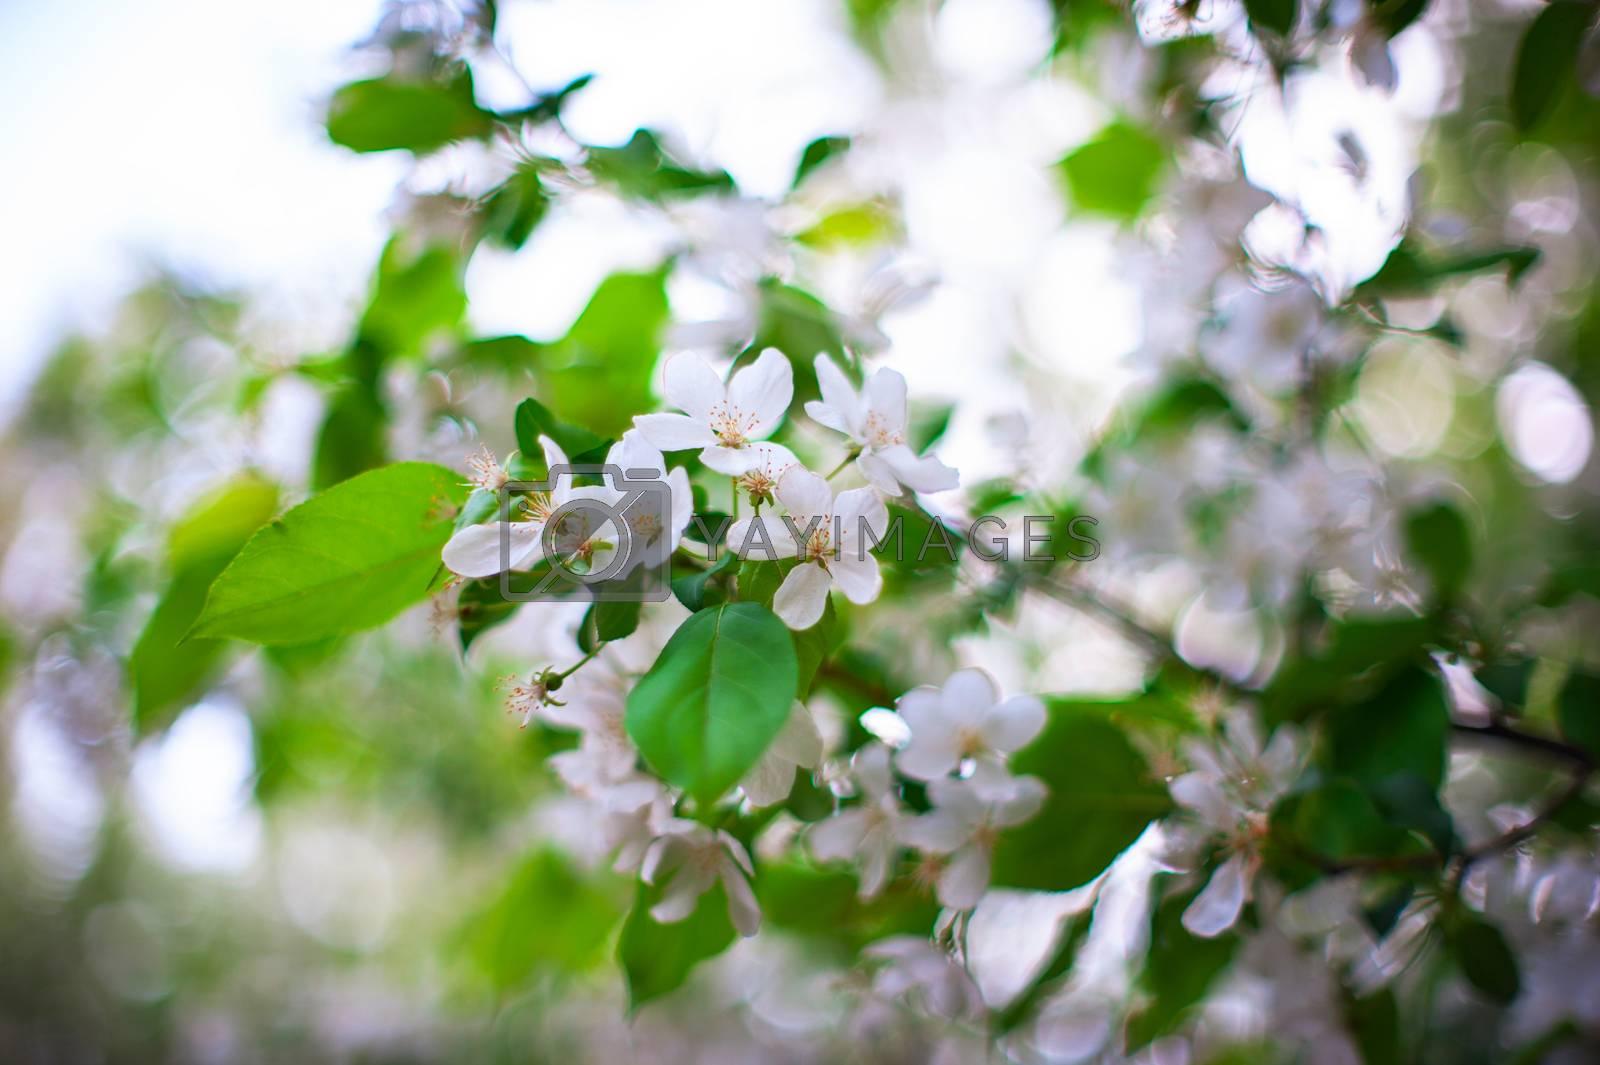 Blooming apple tree in spring time.